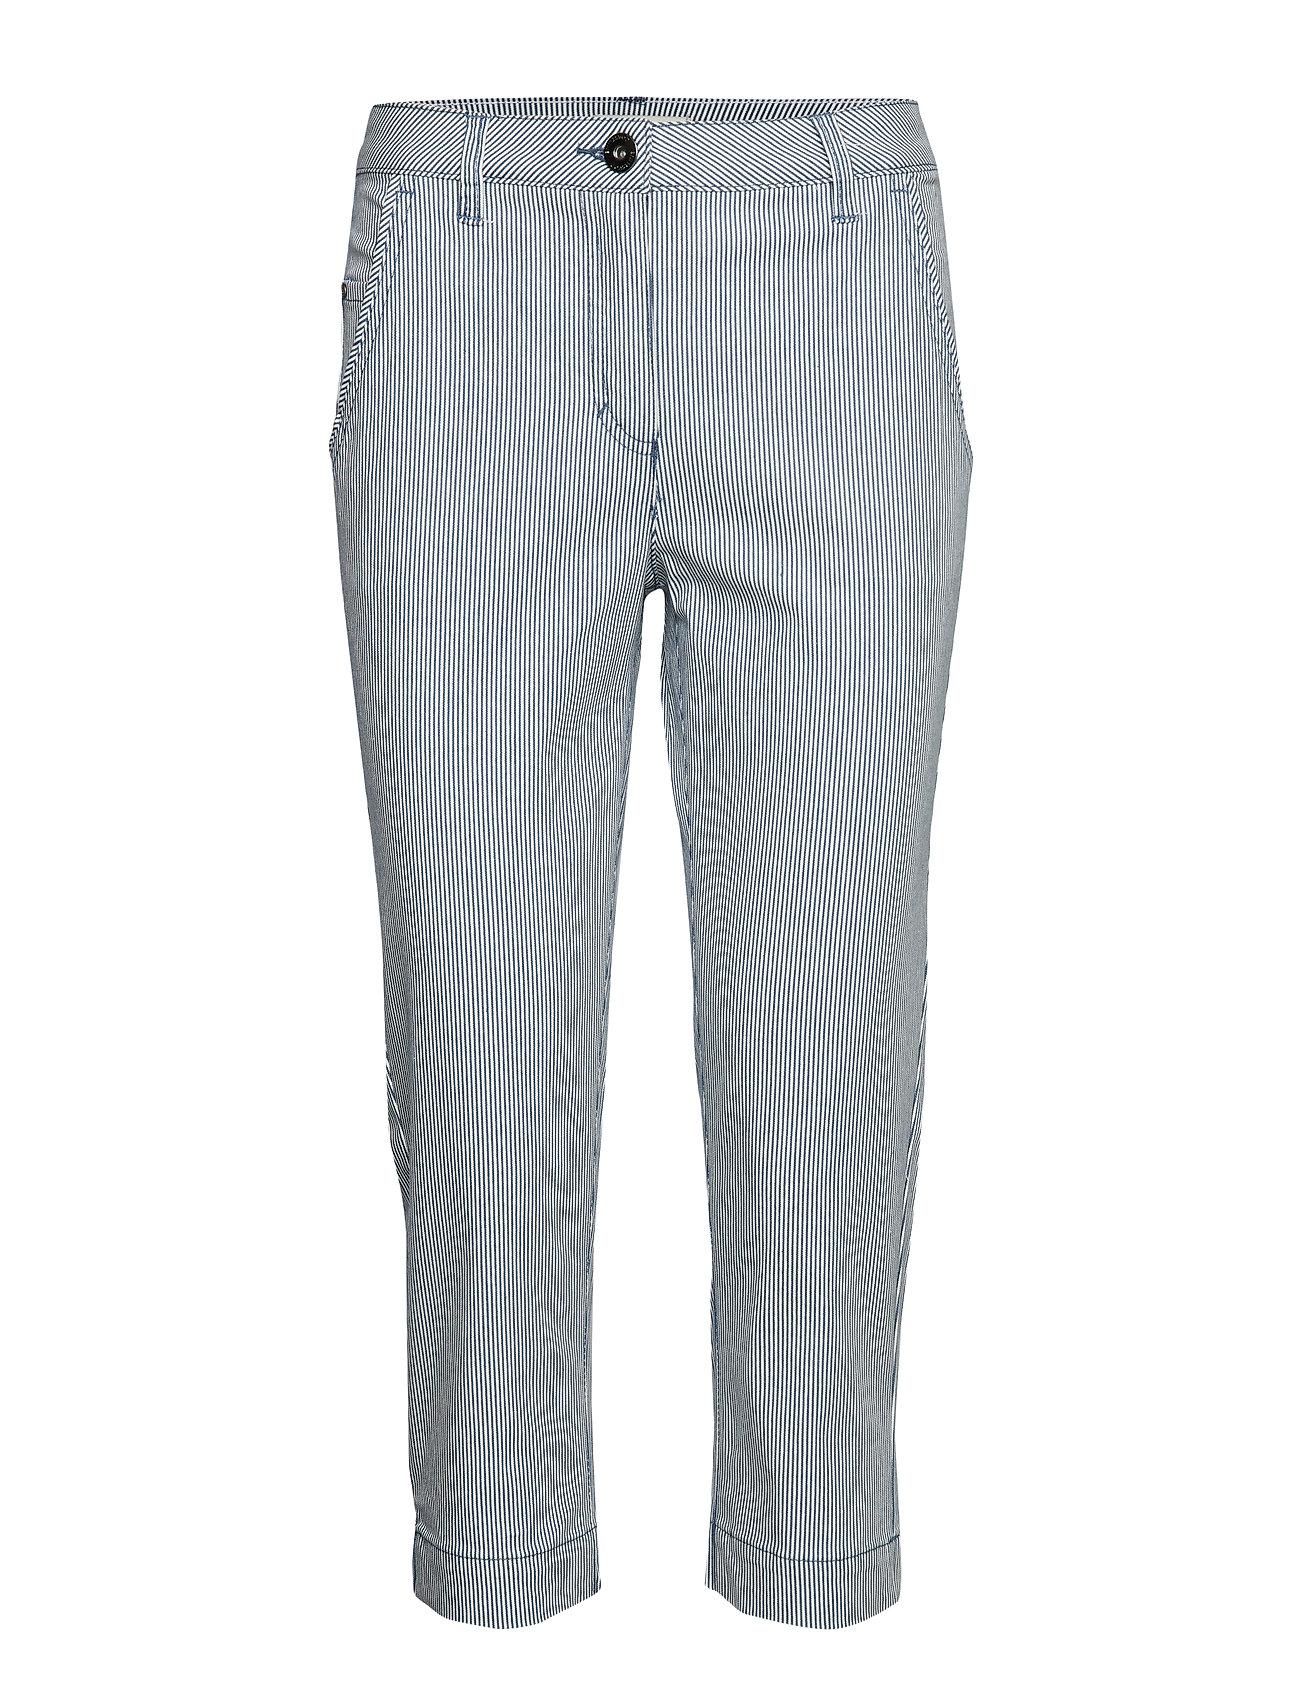 Brandtex Capri pants - DENIM LIGHT BLUE